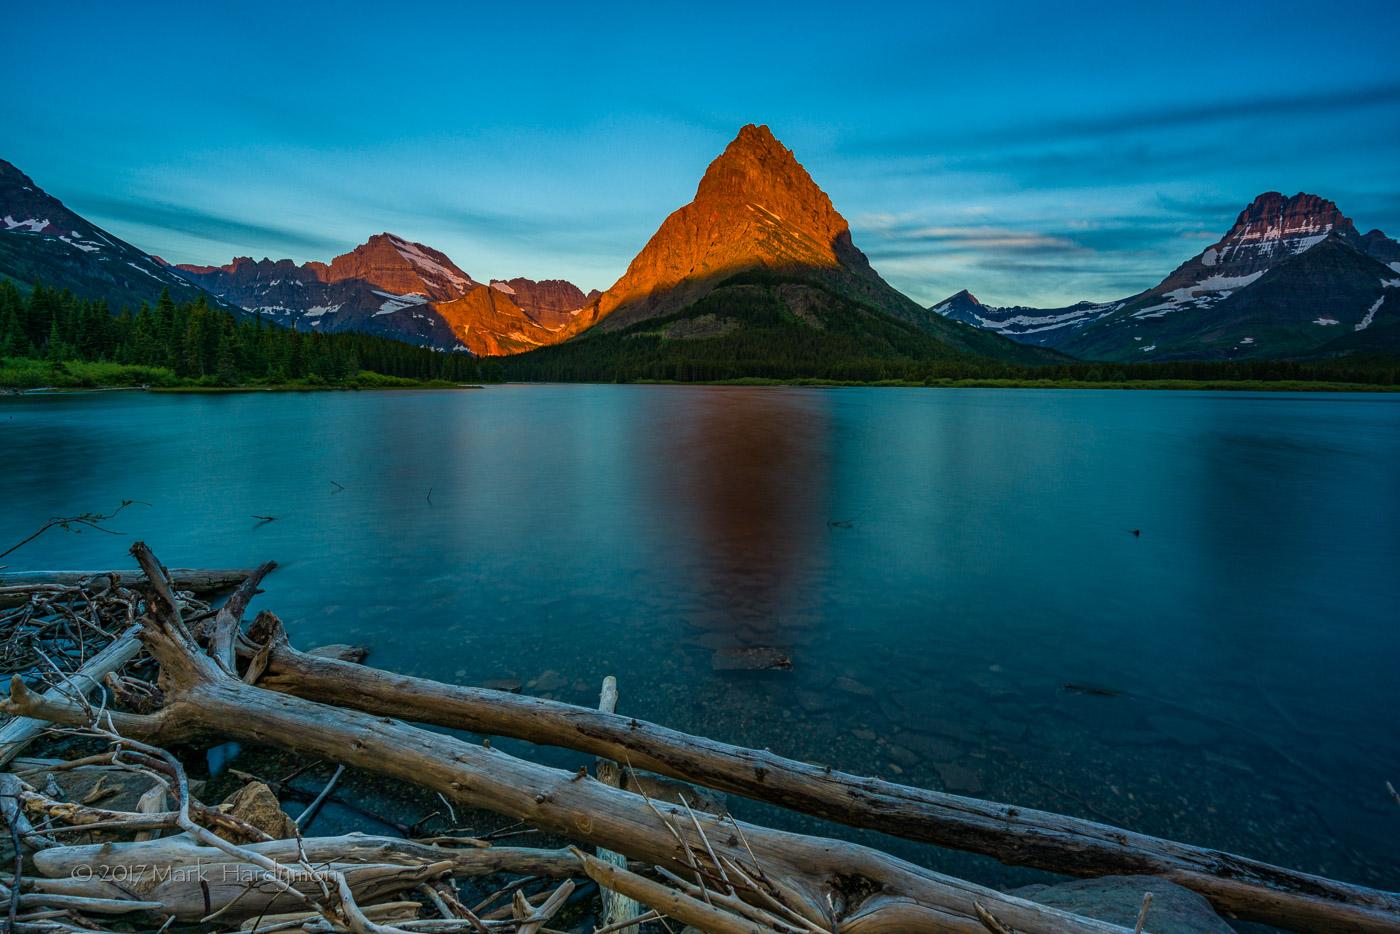 swift_current_lake-7691-Edit